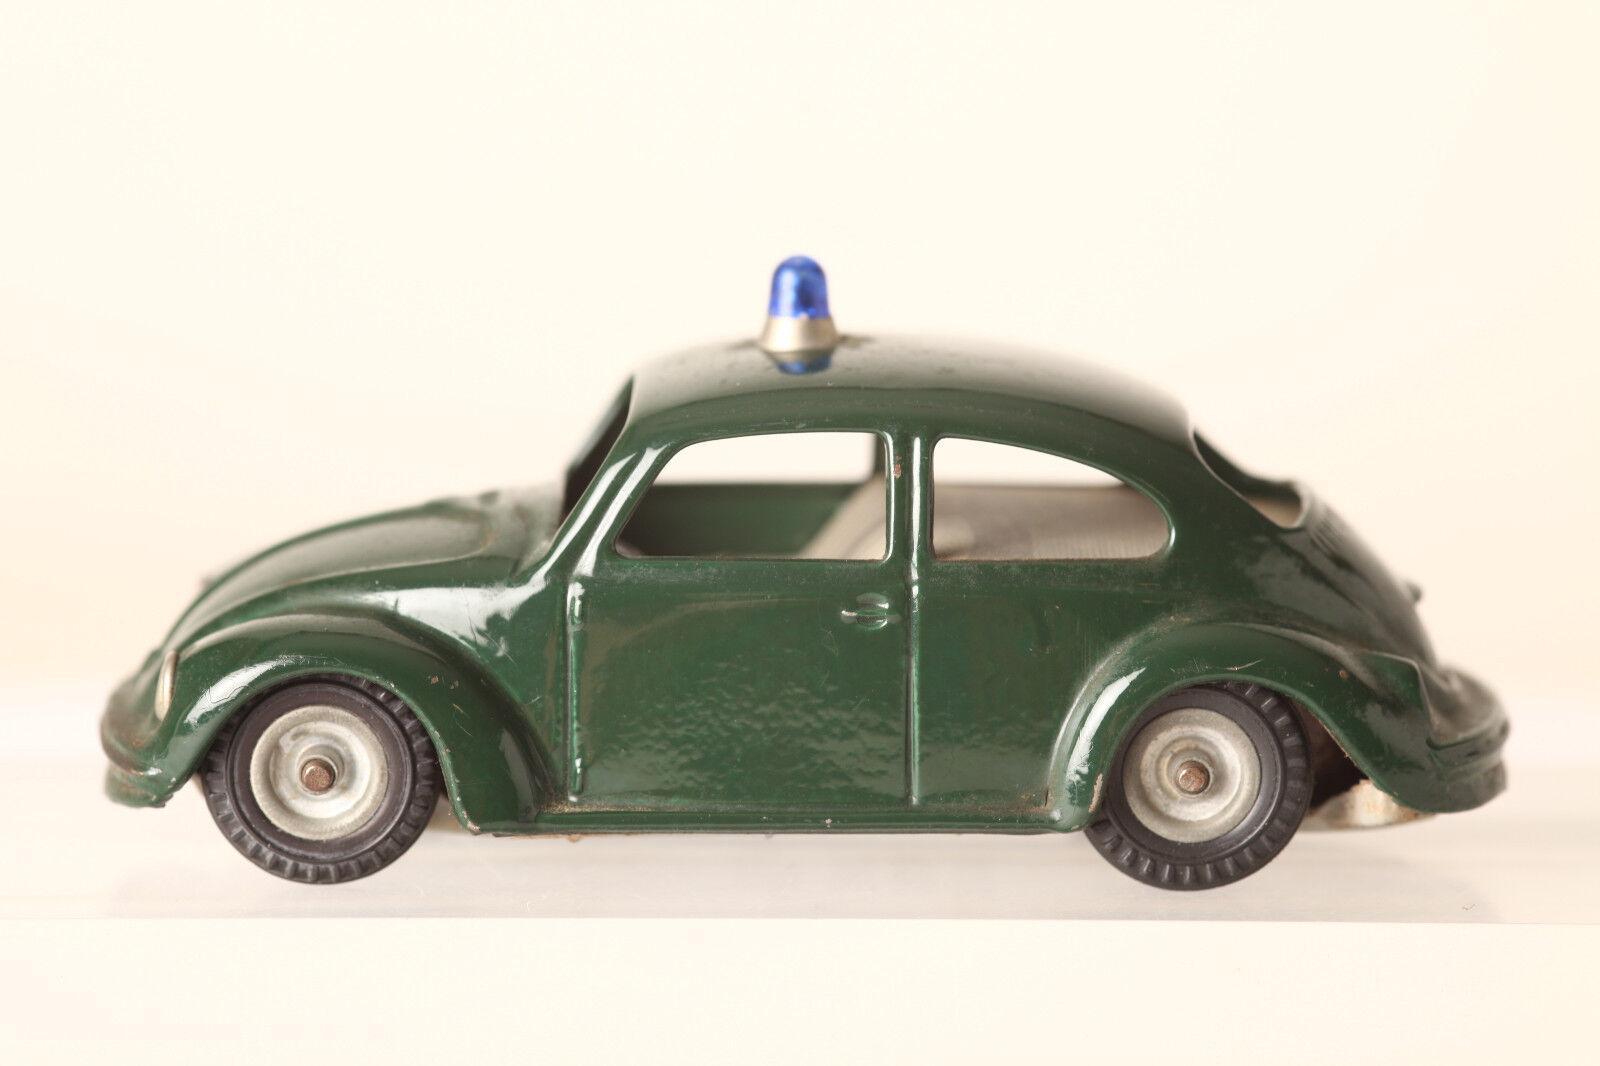 Ko Chapa ca 1 43 403 Coche VW Escarabajo Oliva con Luz blue (62801)